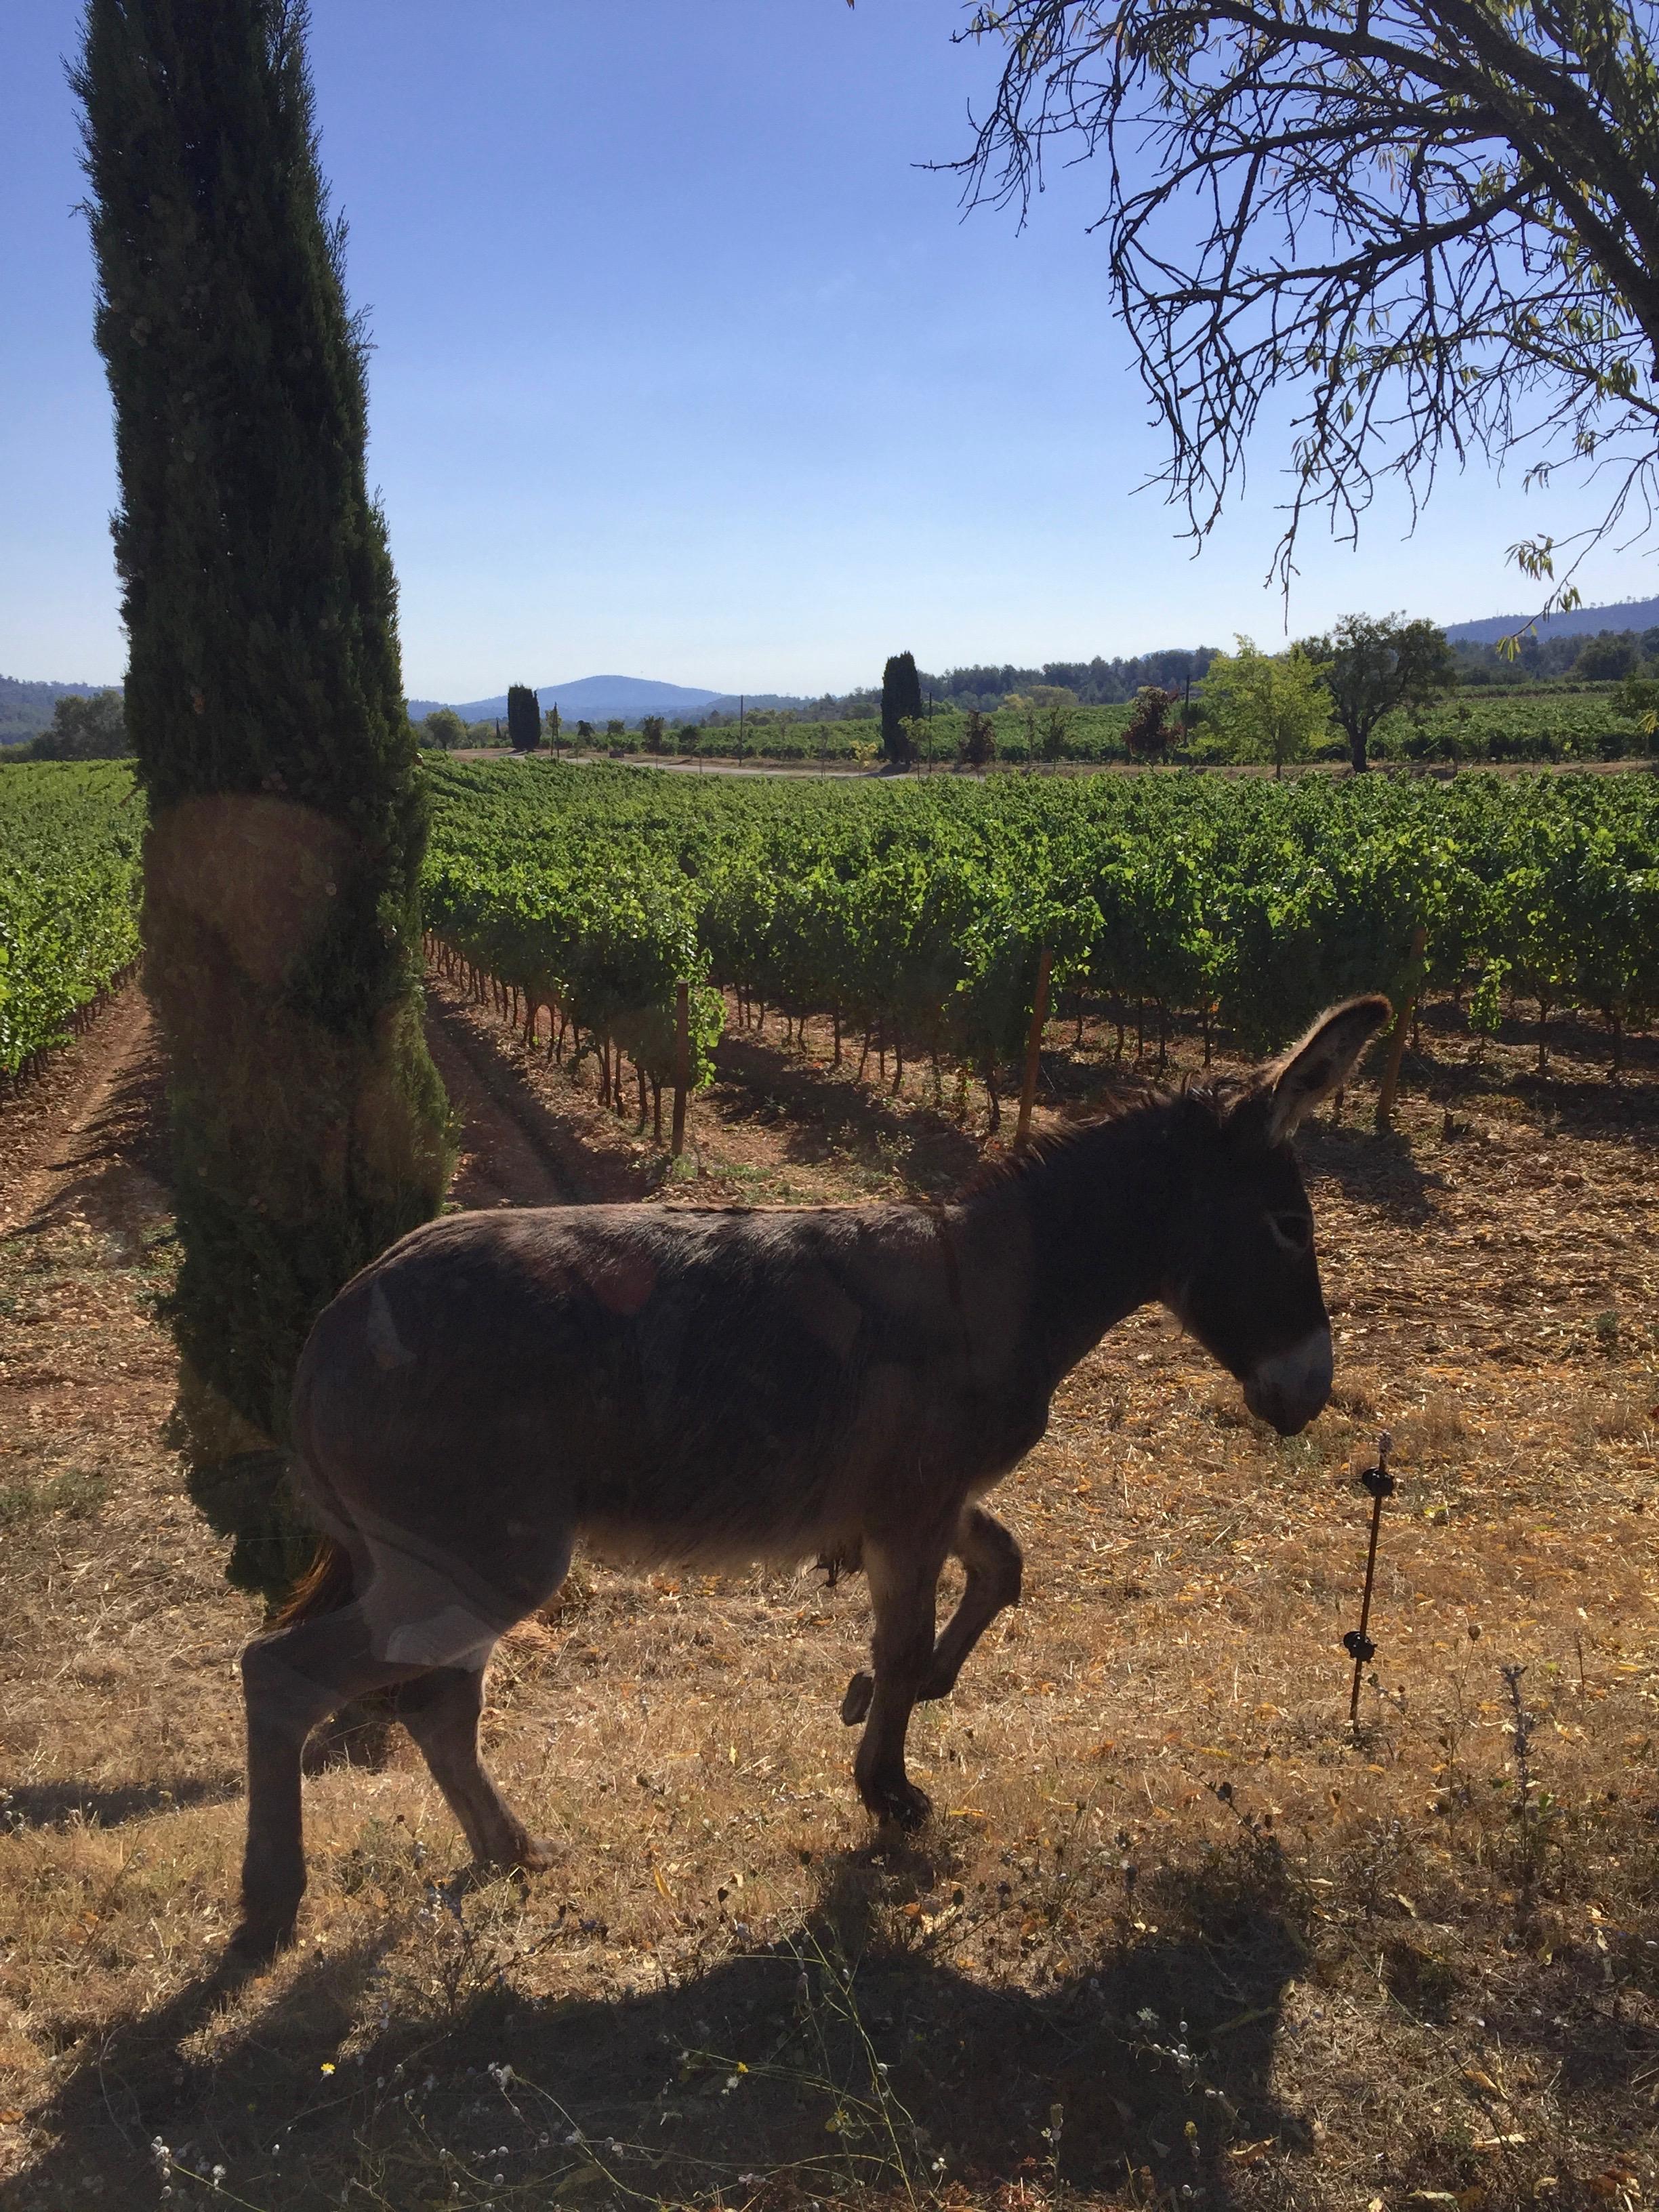 vignelaure vineyard donkey